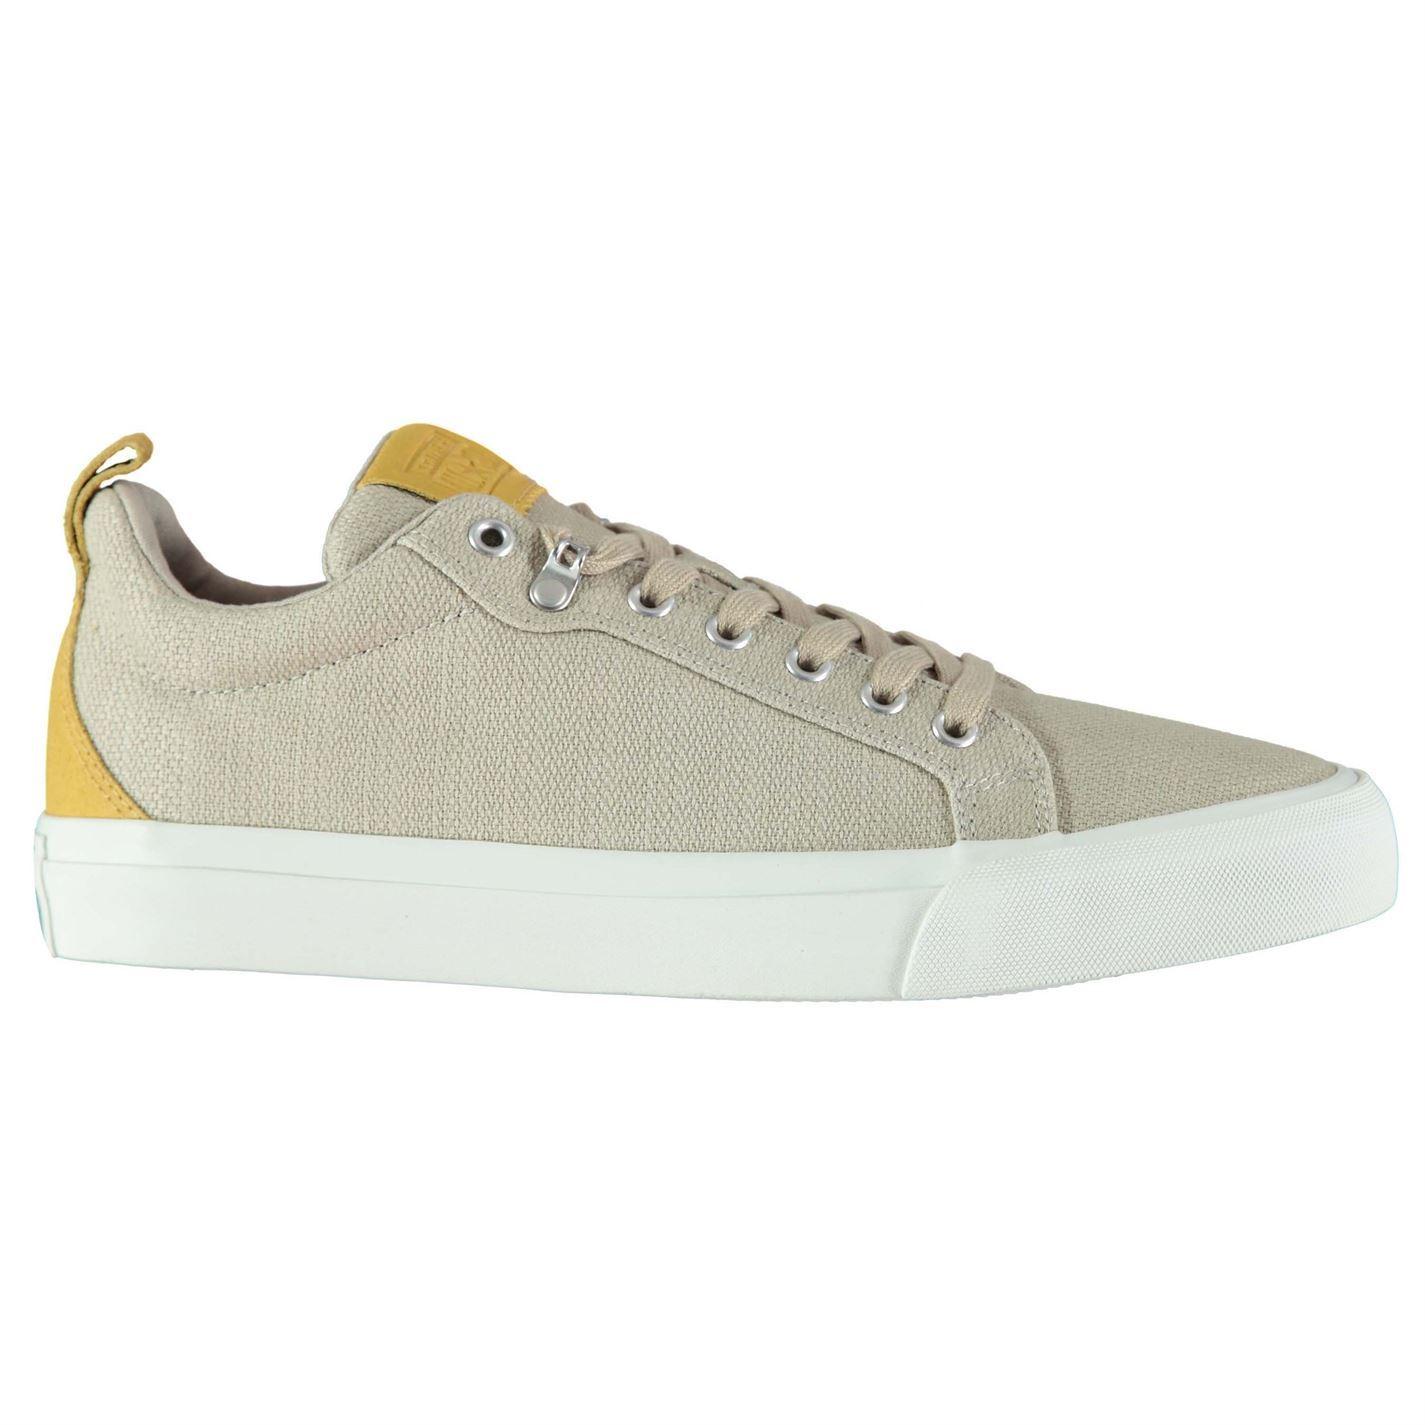 9d9e59466141 ... Converse Fulton Lo Canvas Shoes Mens Beige Footwear Trainers Sneakers  ...